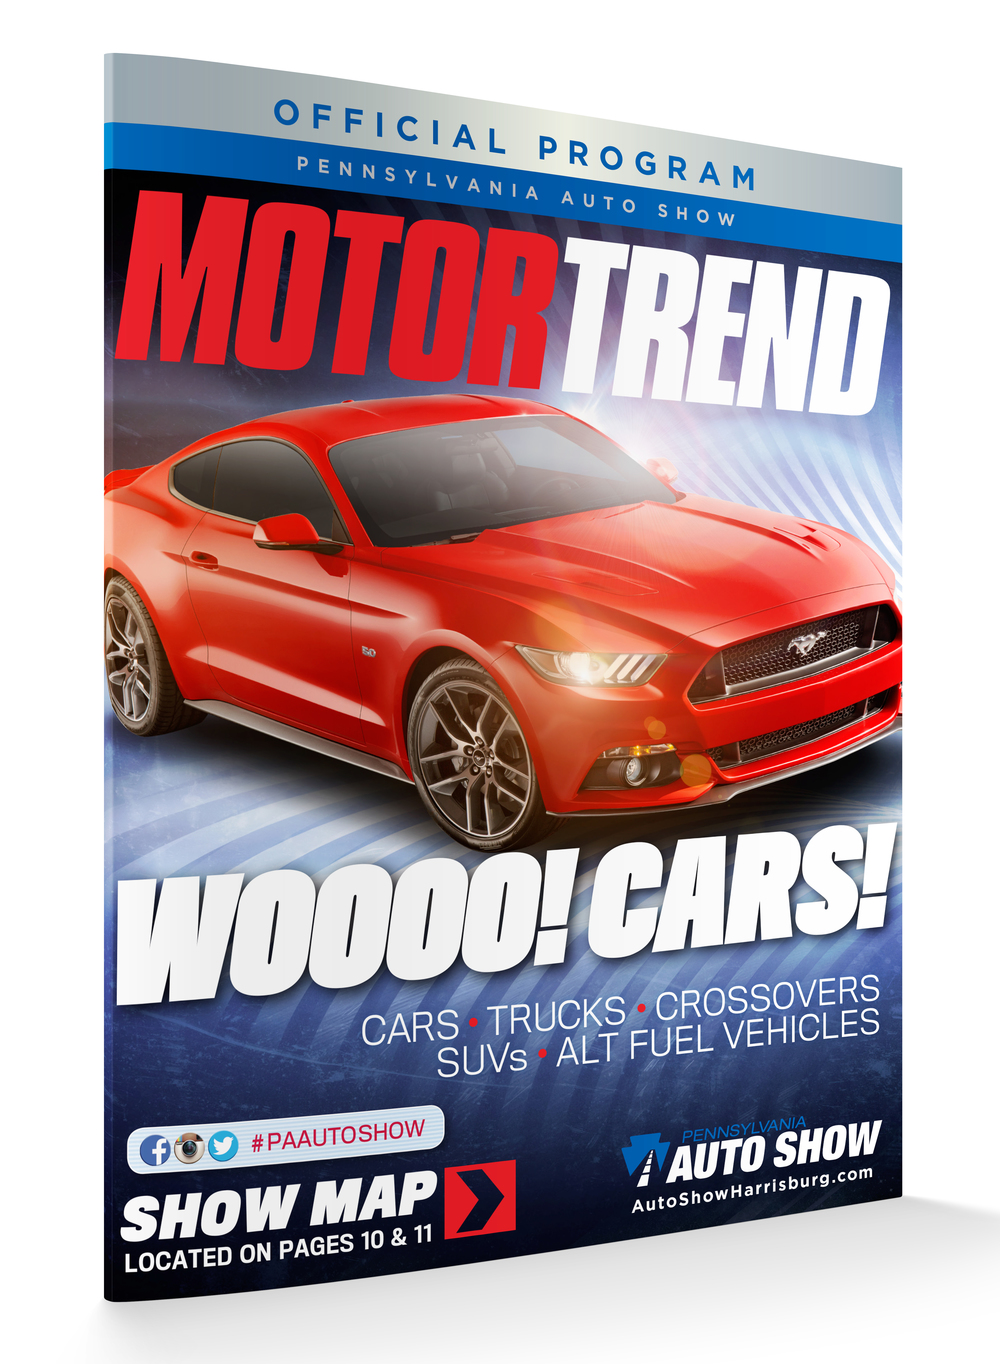 2015 Pennsylvania Auto Show Program Book Cover